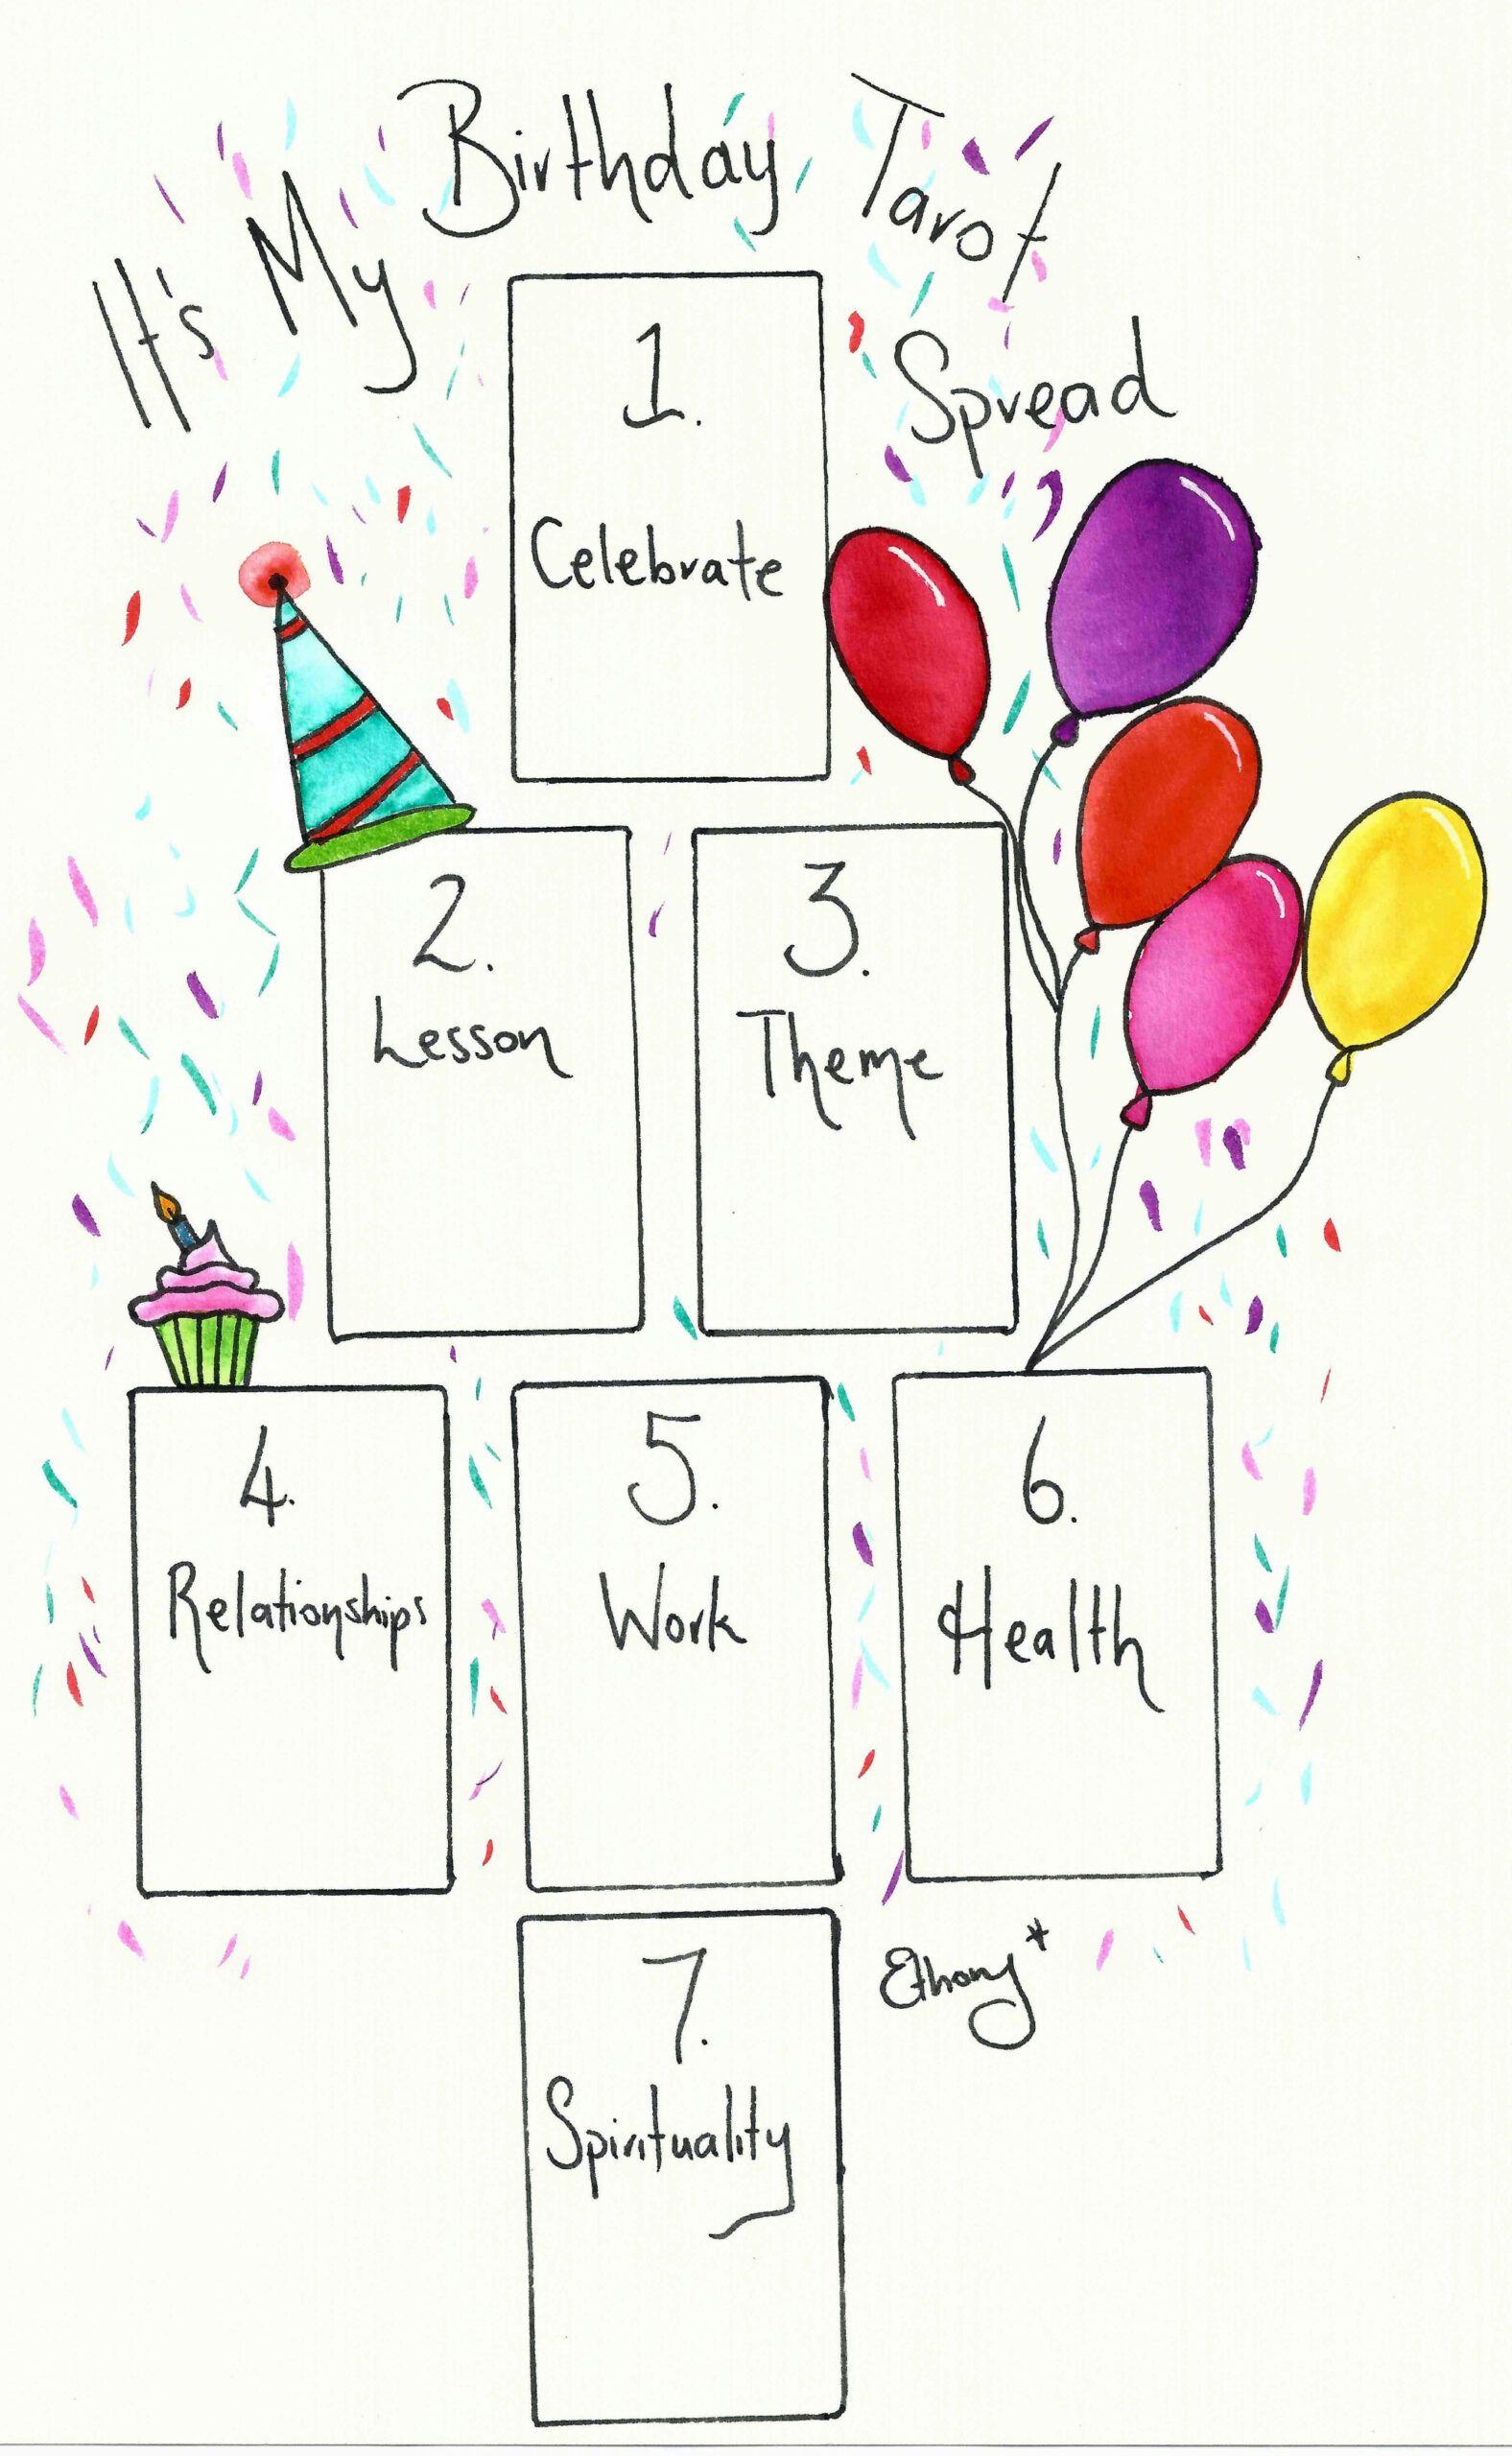 Tarot Card Birthday in 7  Tarot card spreads, Tarot spreads